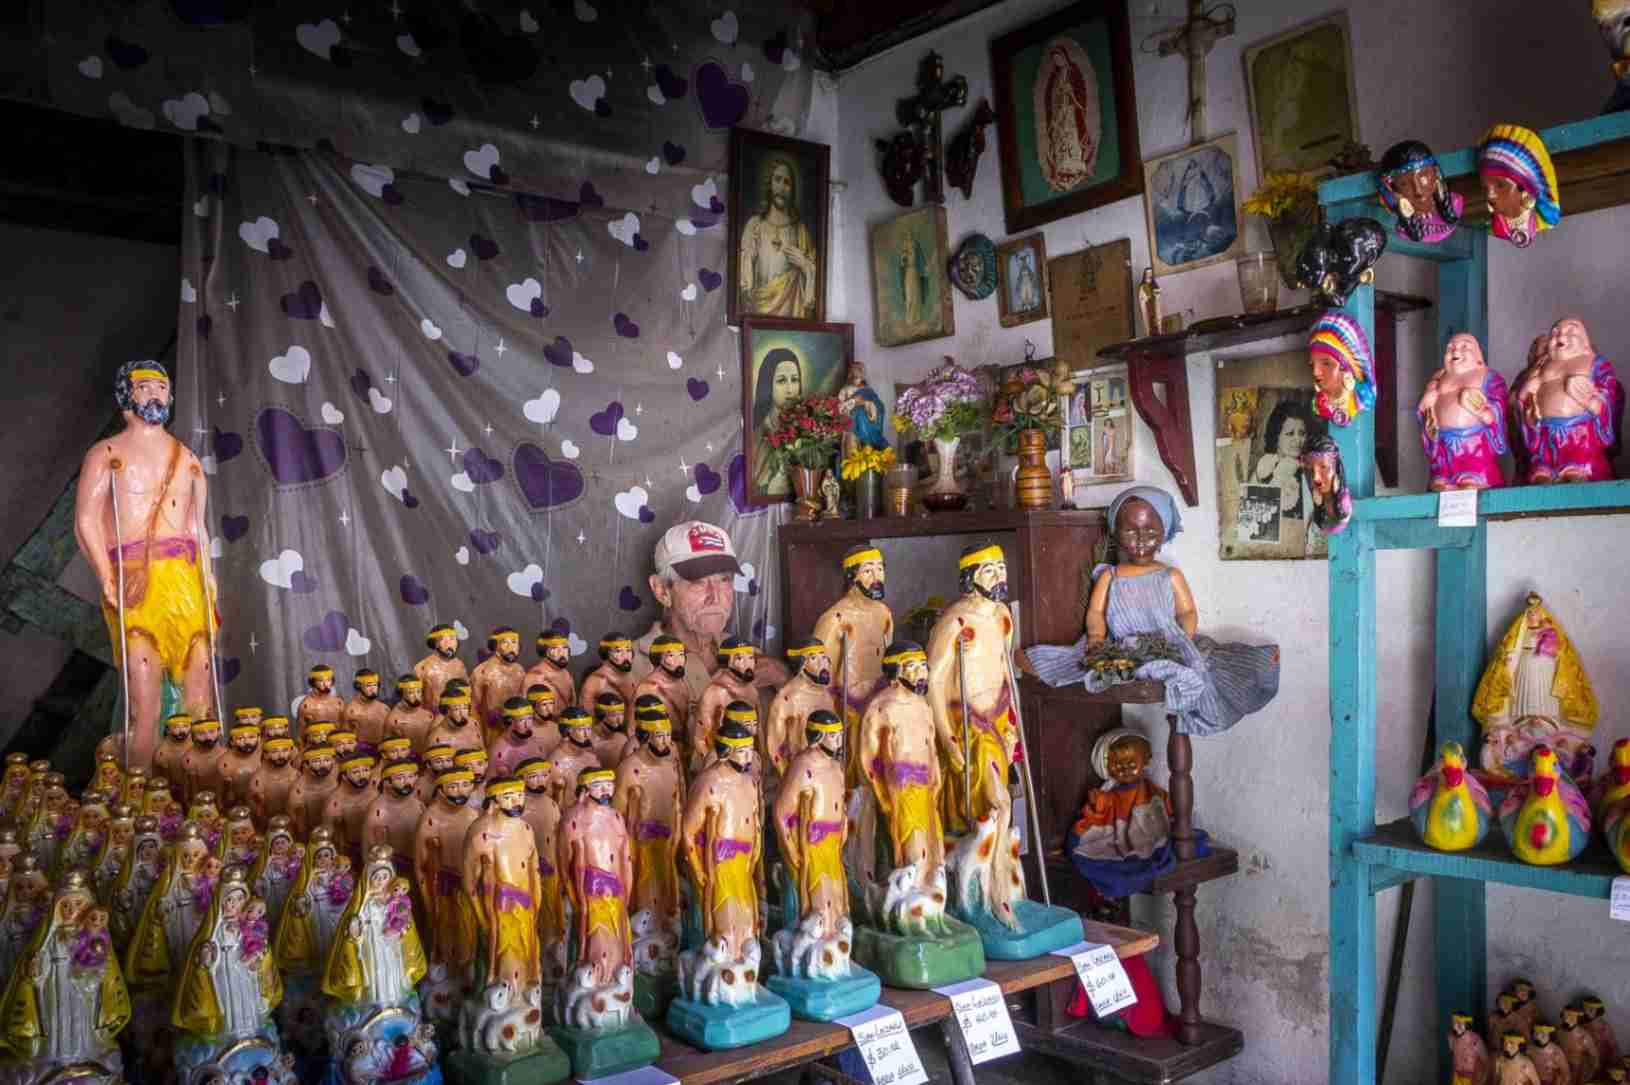 Obra: Cuba, after the Soviet Union 06